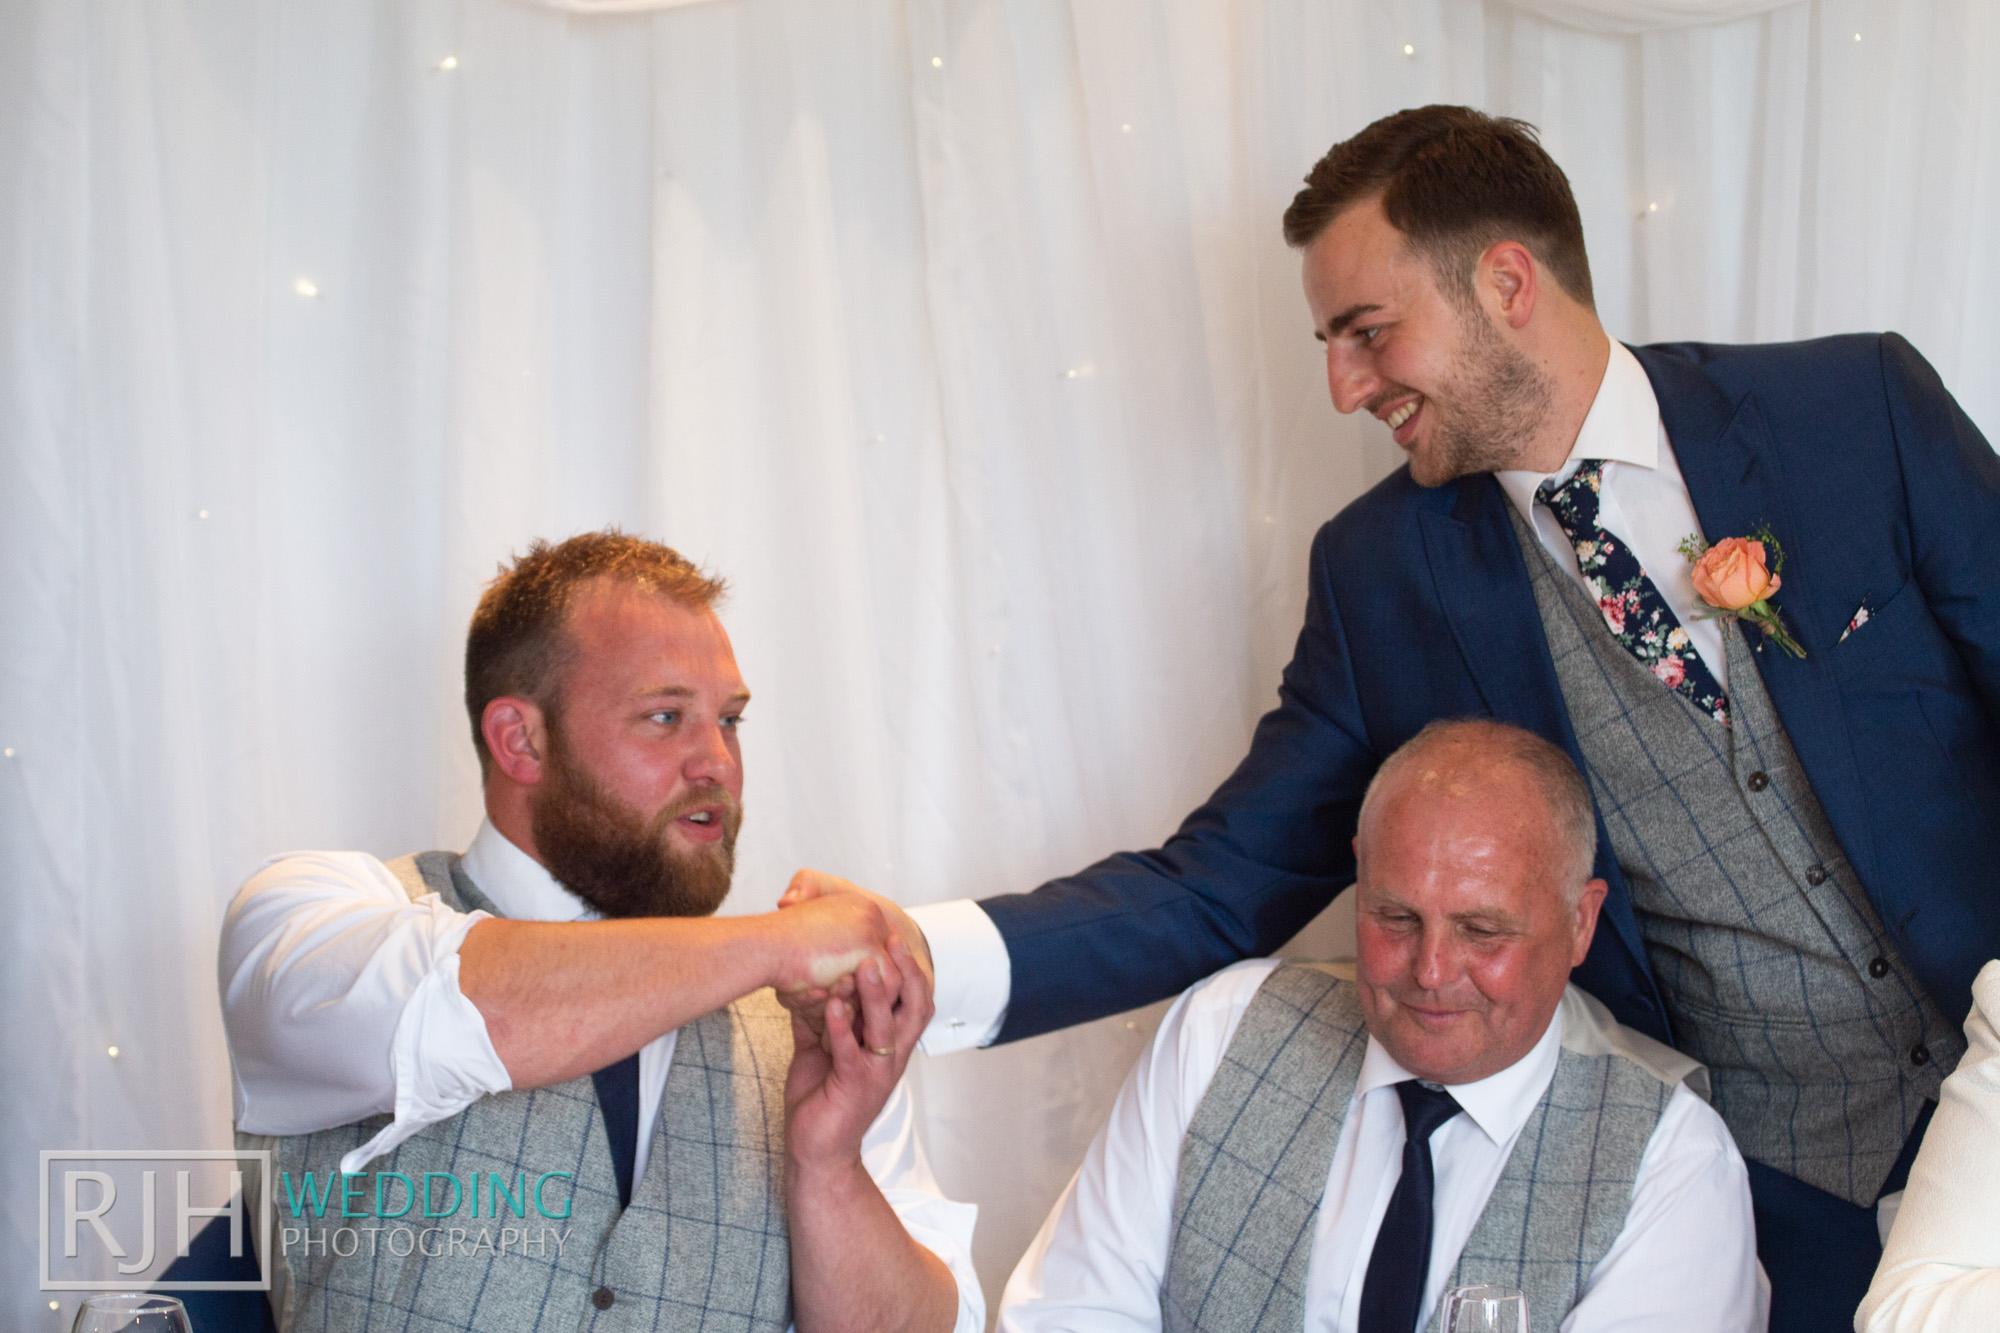 Whirlowbrook Hall Wedding Photography_Jack & Lydia_060_IMG_4605.jpg